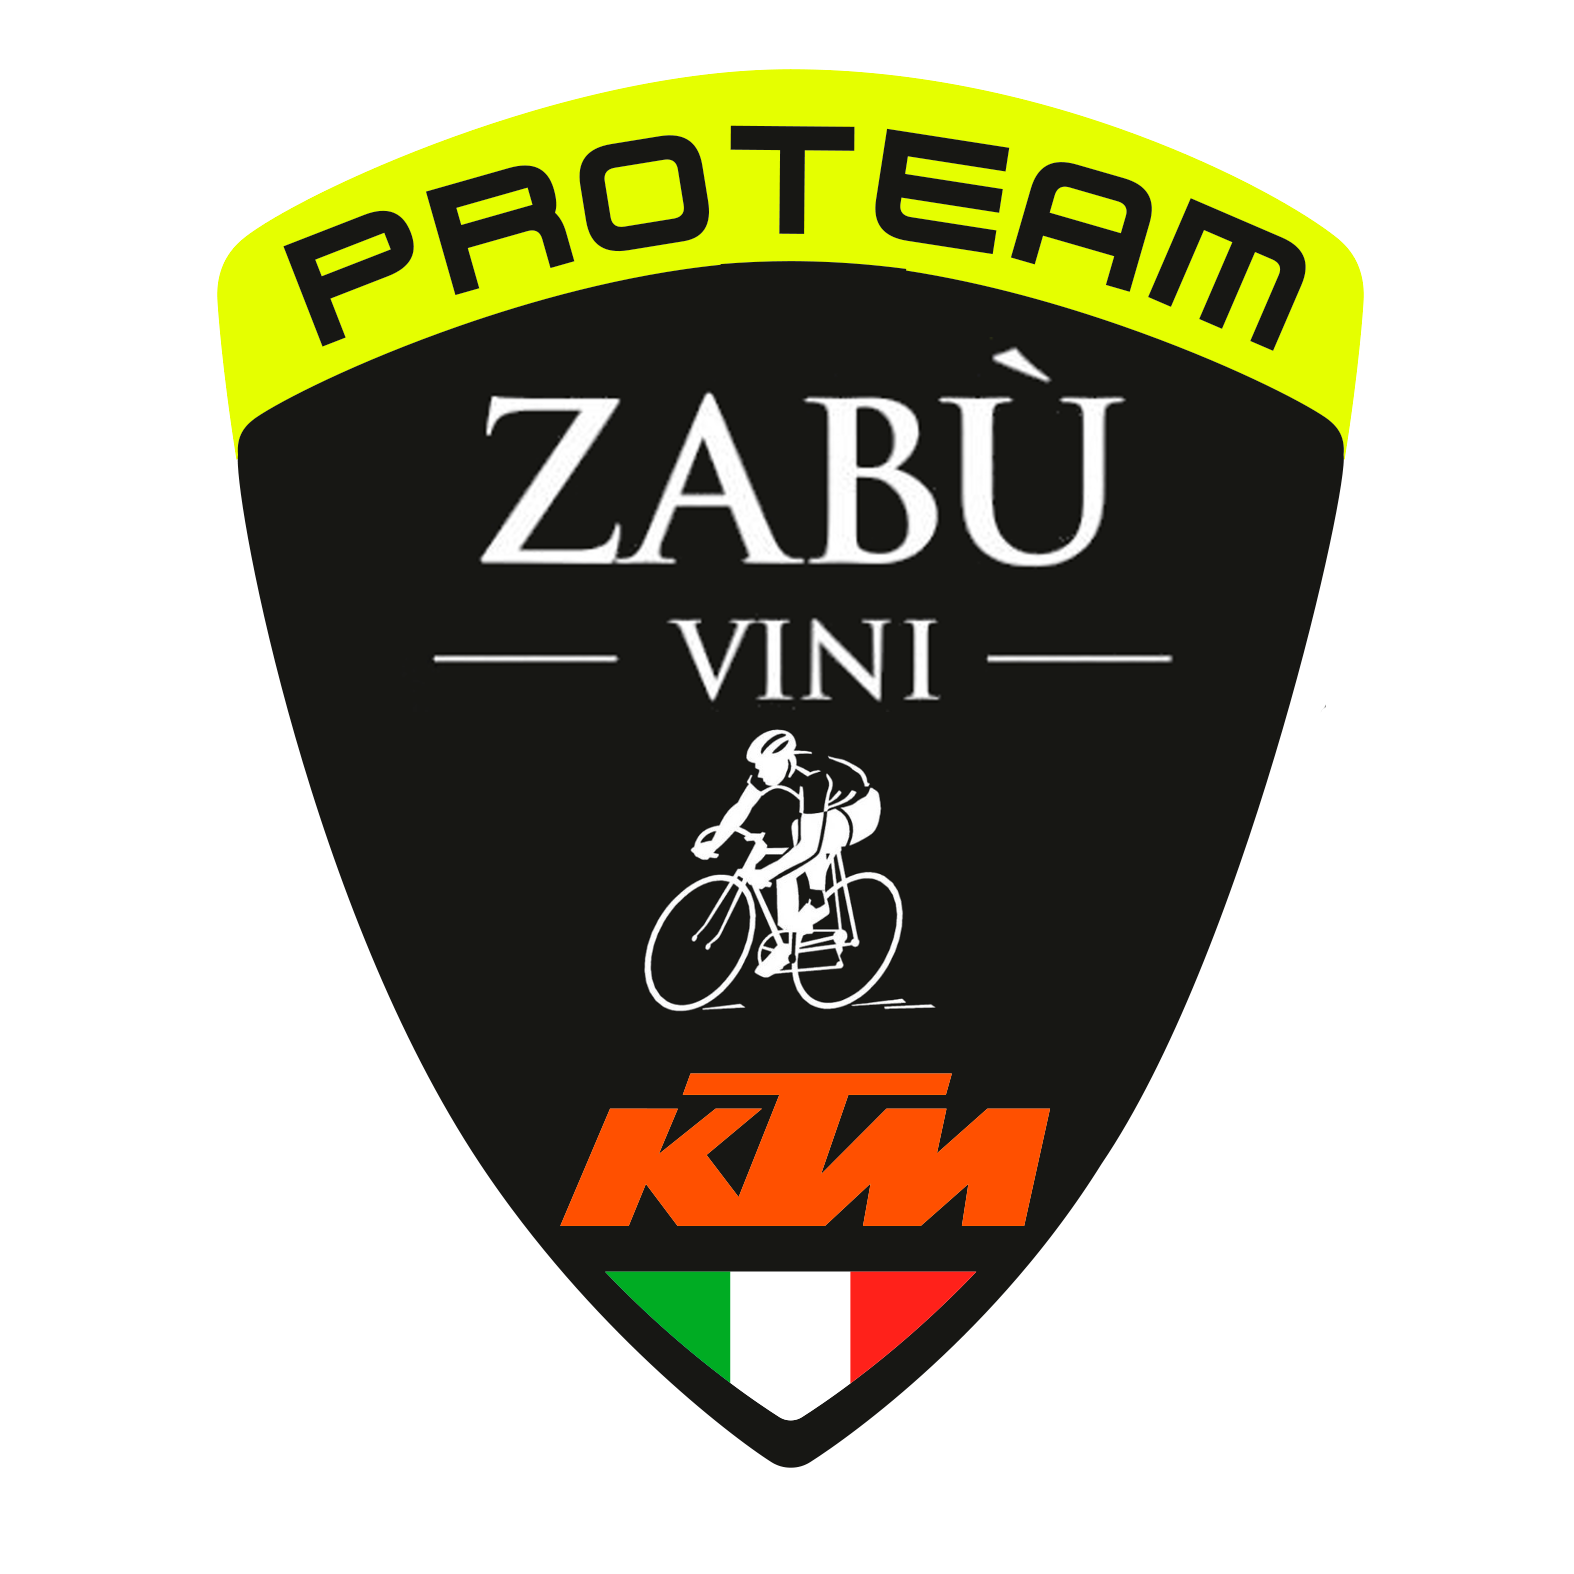 Vinizabu KTM